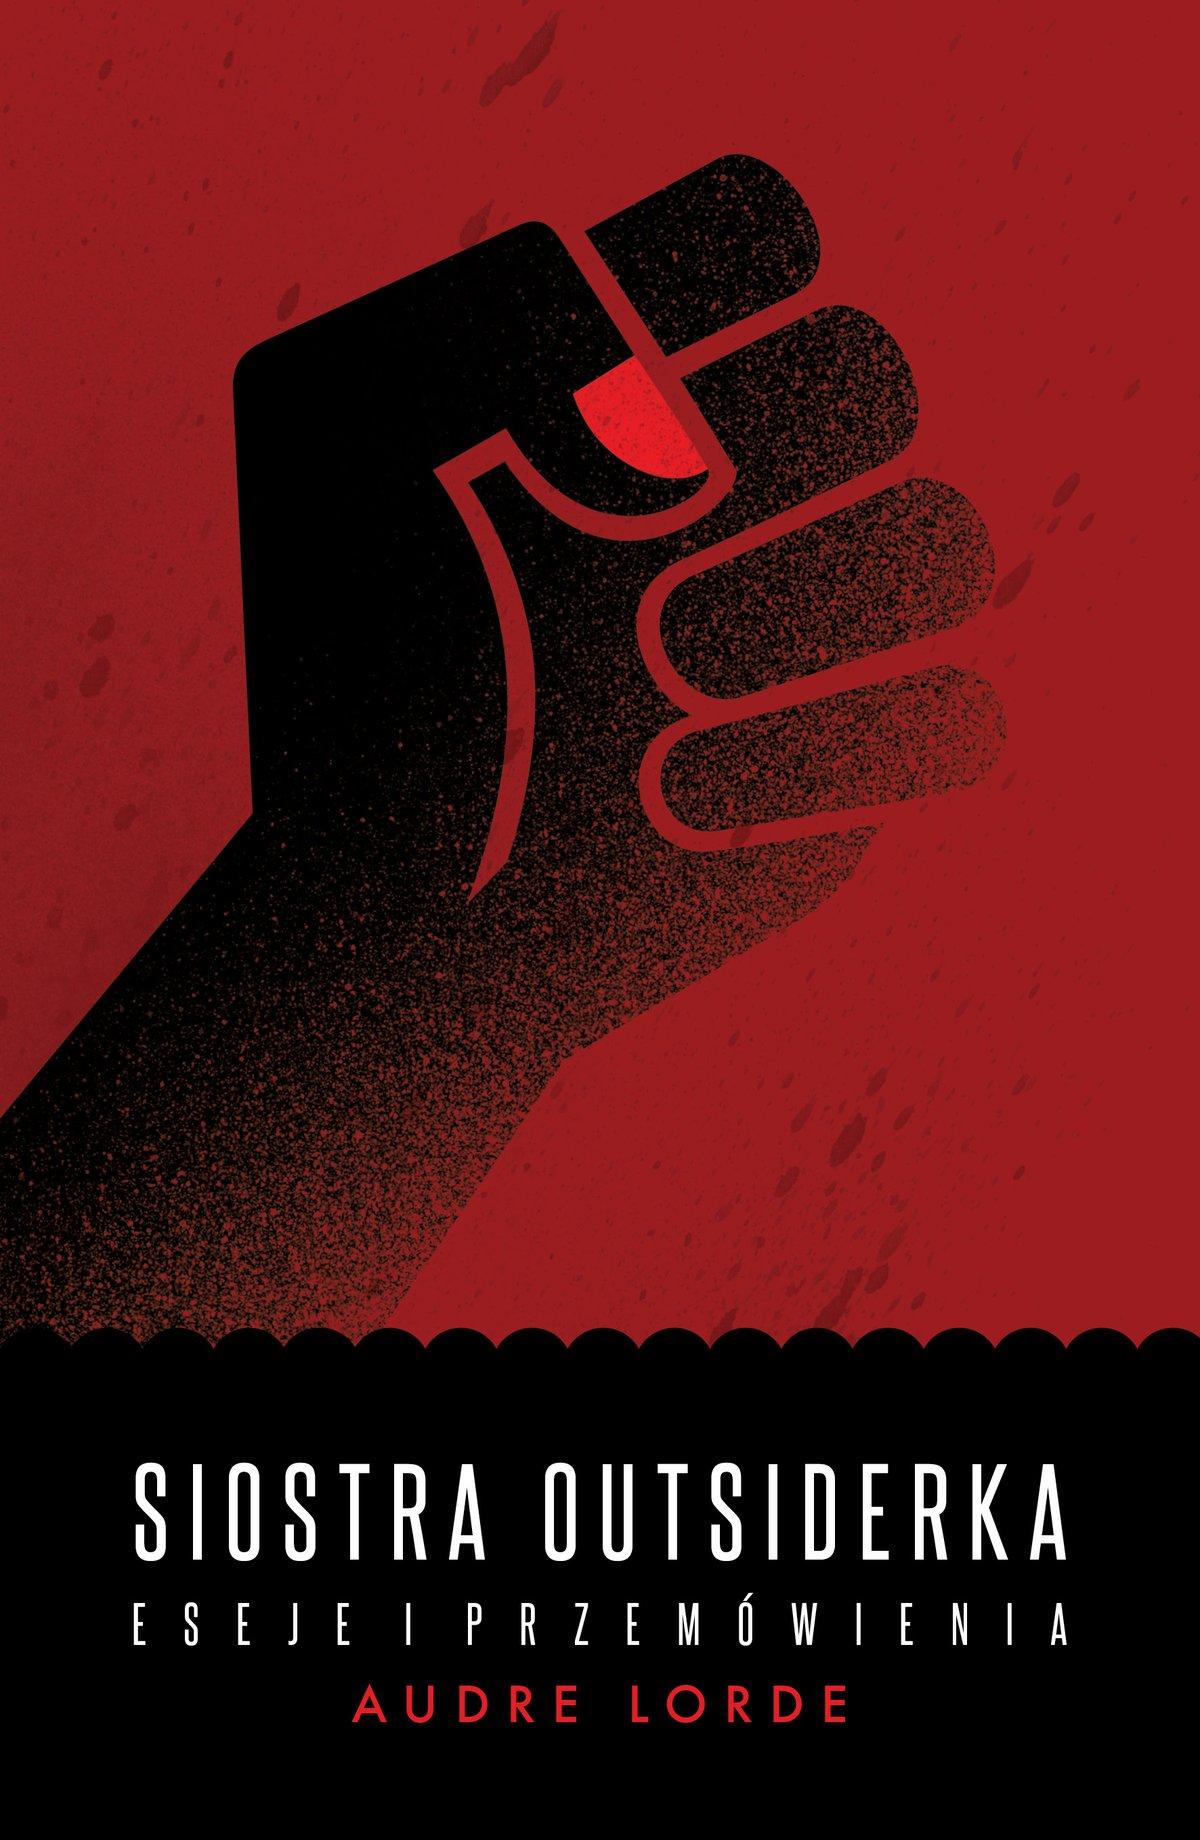 Siostra Outsiderka - Ebook (Książka EPUB) do pobrania w formacie EPUB